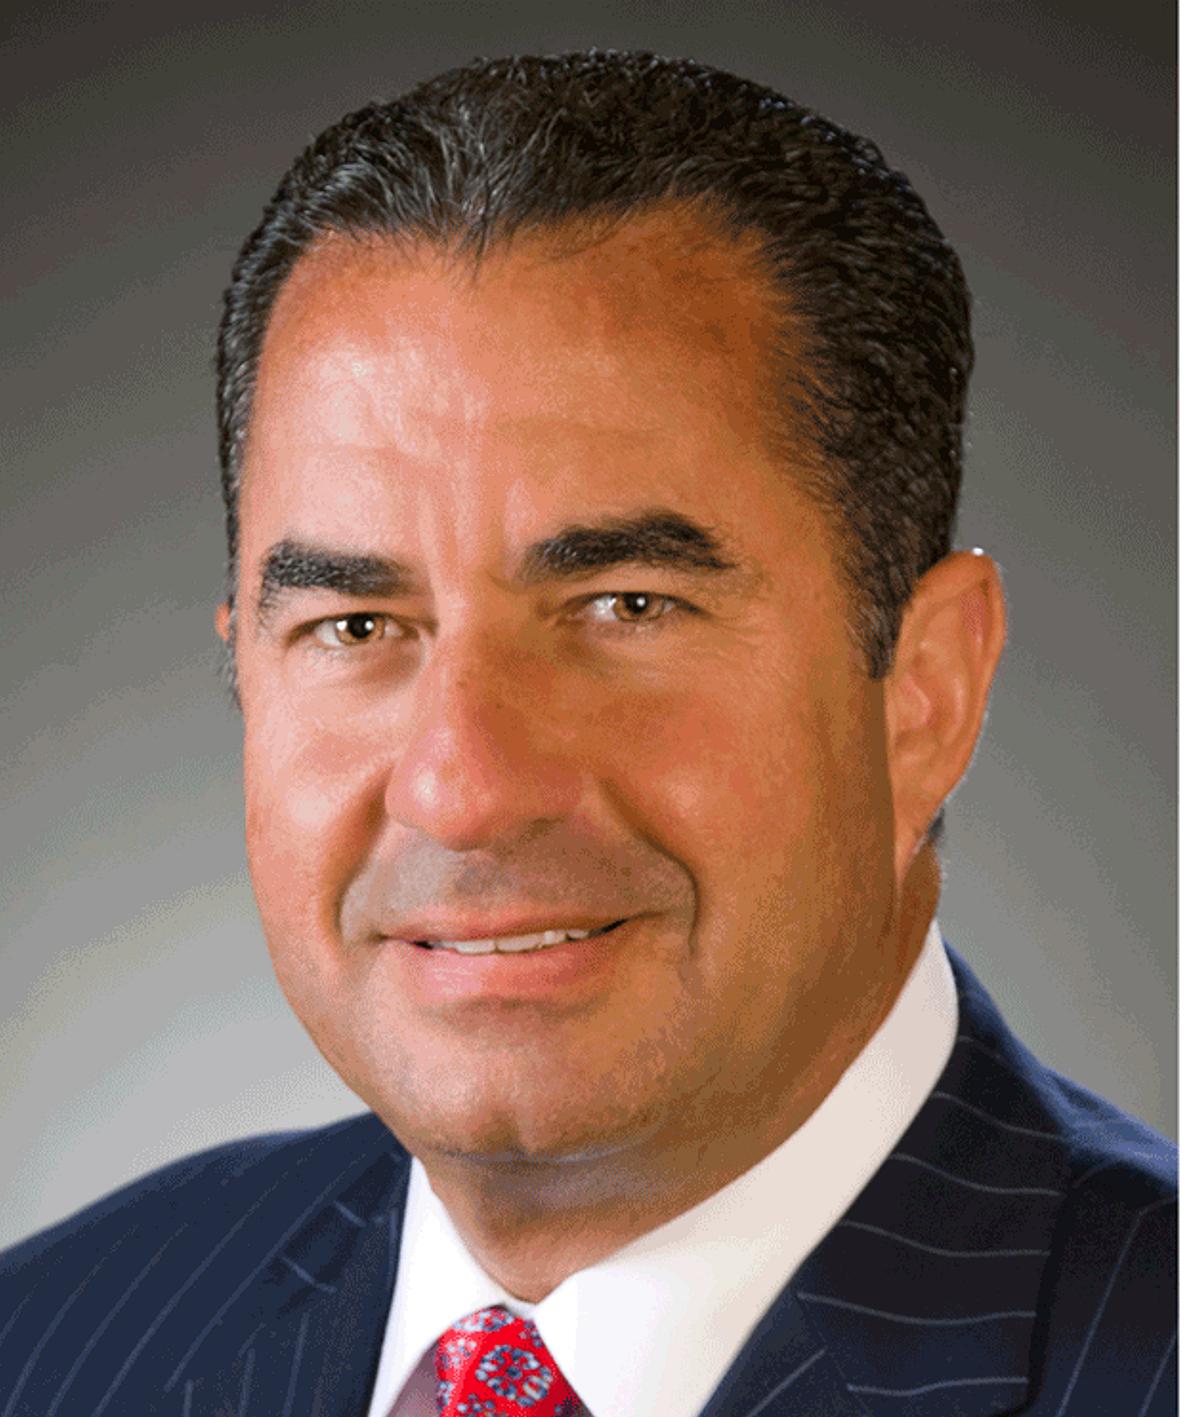 Robert Klonk Oswald Companies CEO